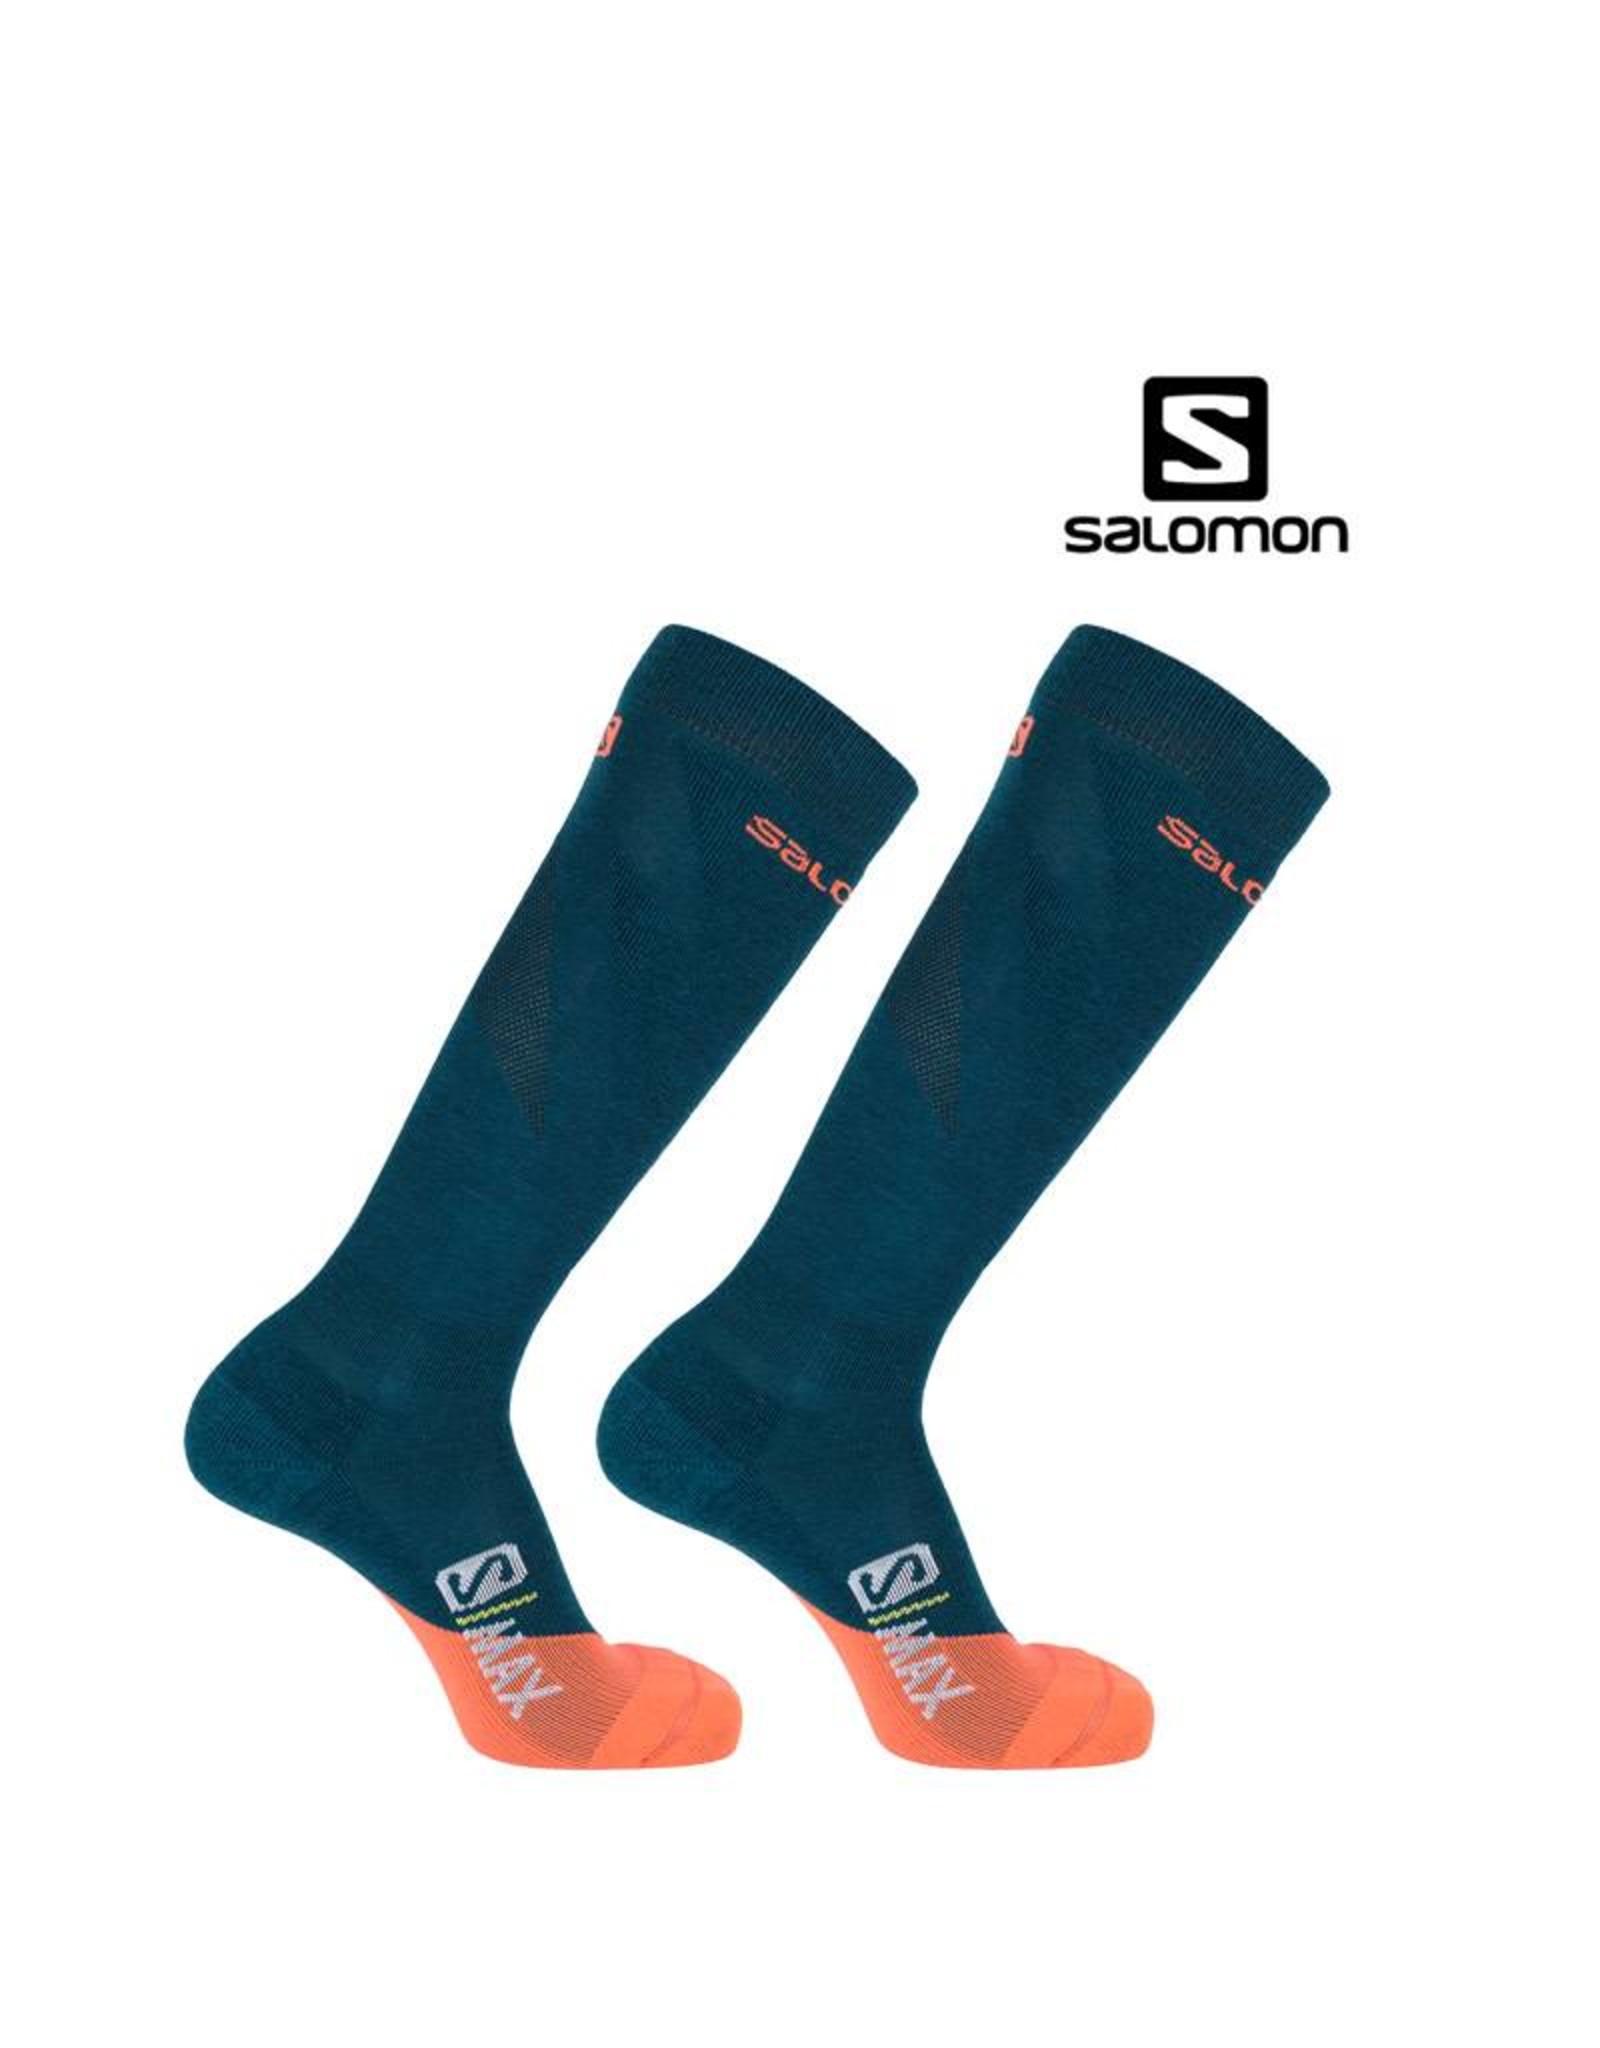 SALOMON SALOMON SKISOKKEN S/MAX Groen-Oranje